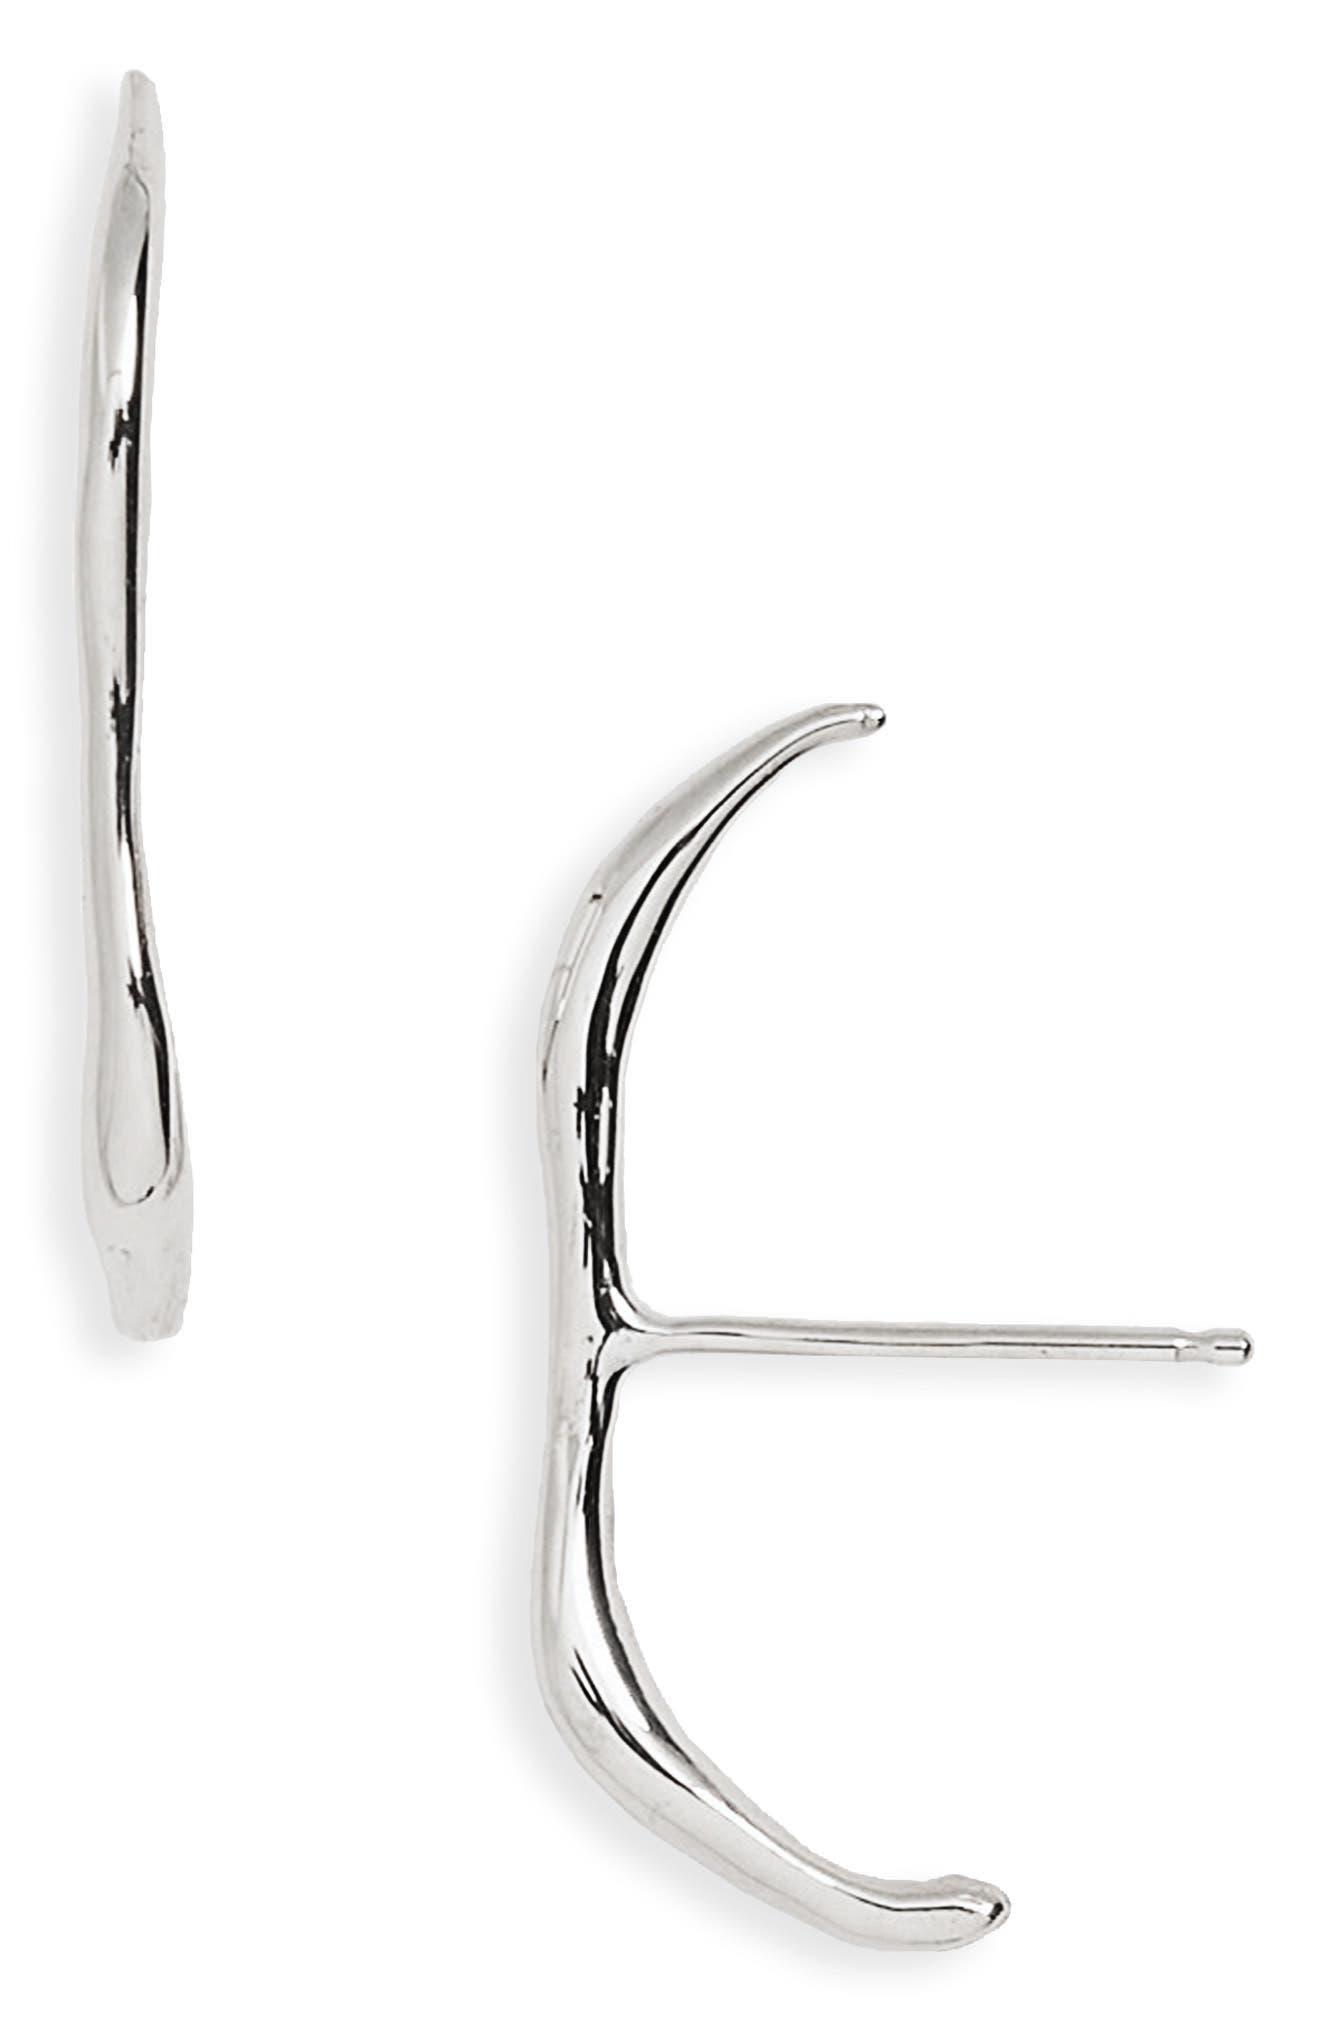 Vero Stud Earrings,                         Main,                         color, STERLING SILVER